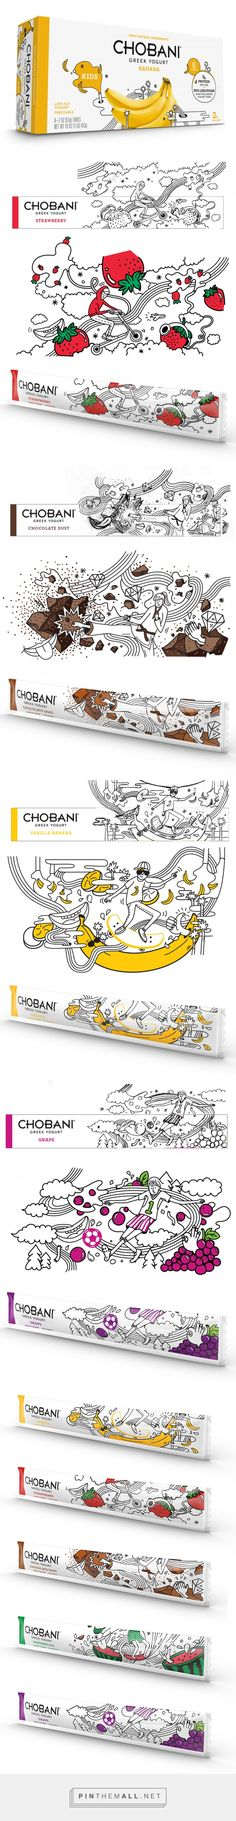 Chobani Yogurt Kids — The Dieline - Branding & Packaging where can I find these!